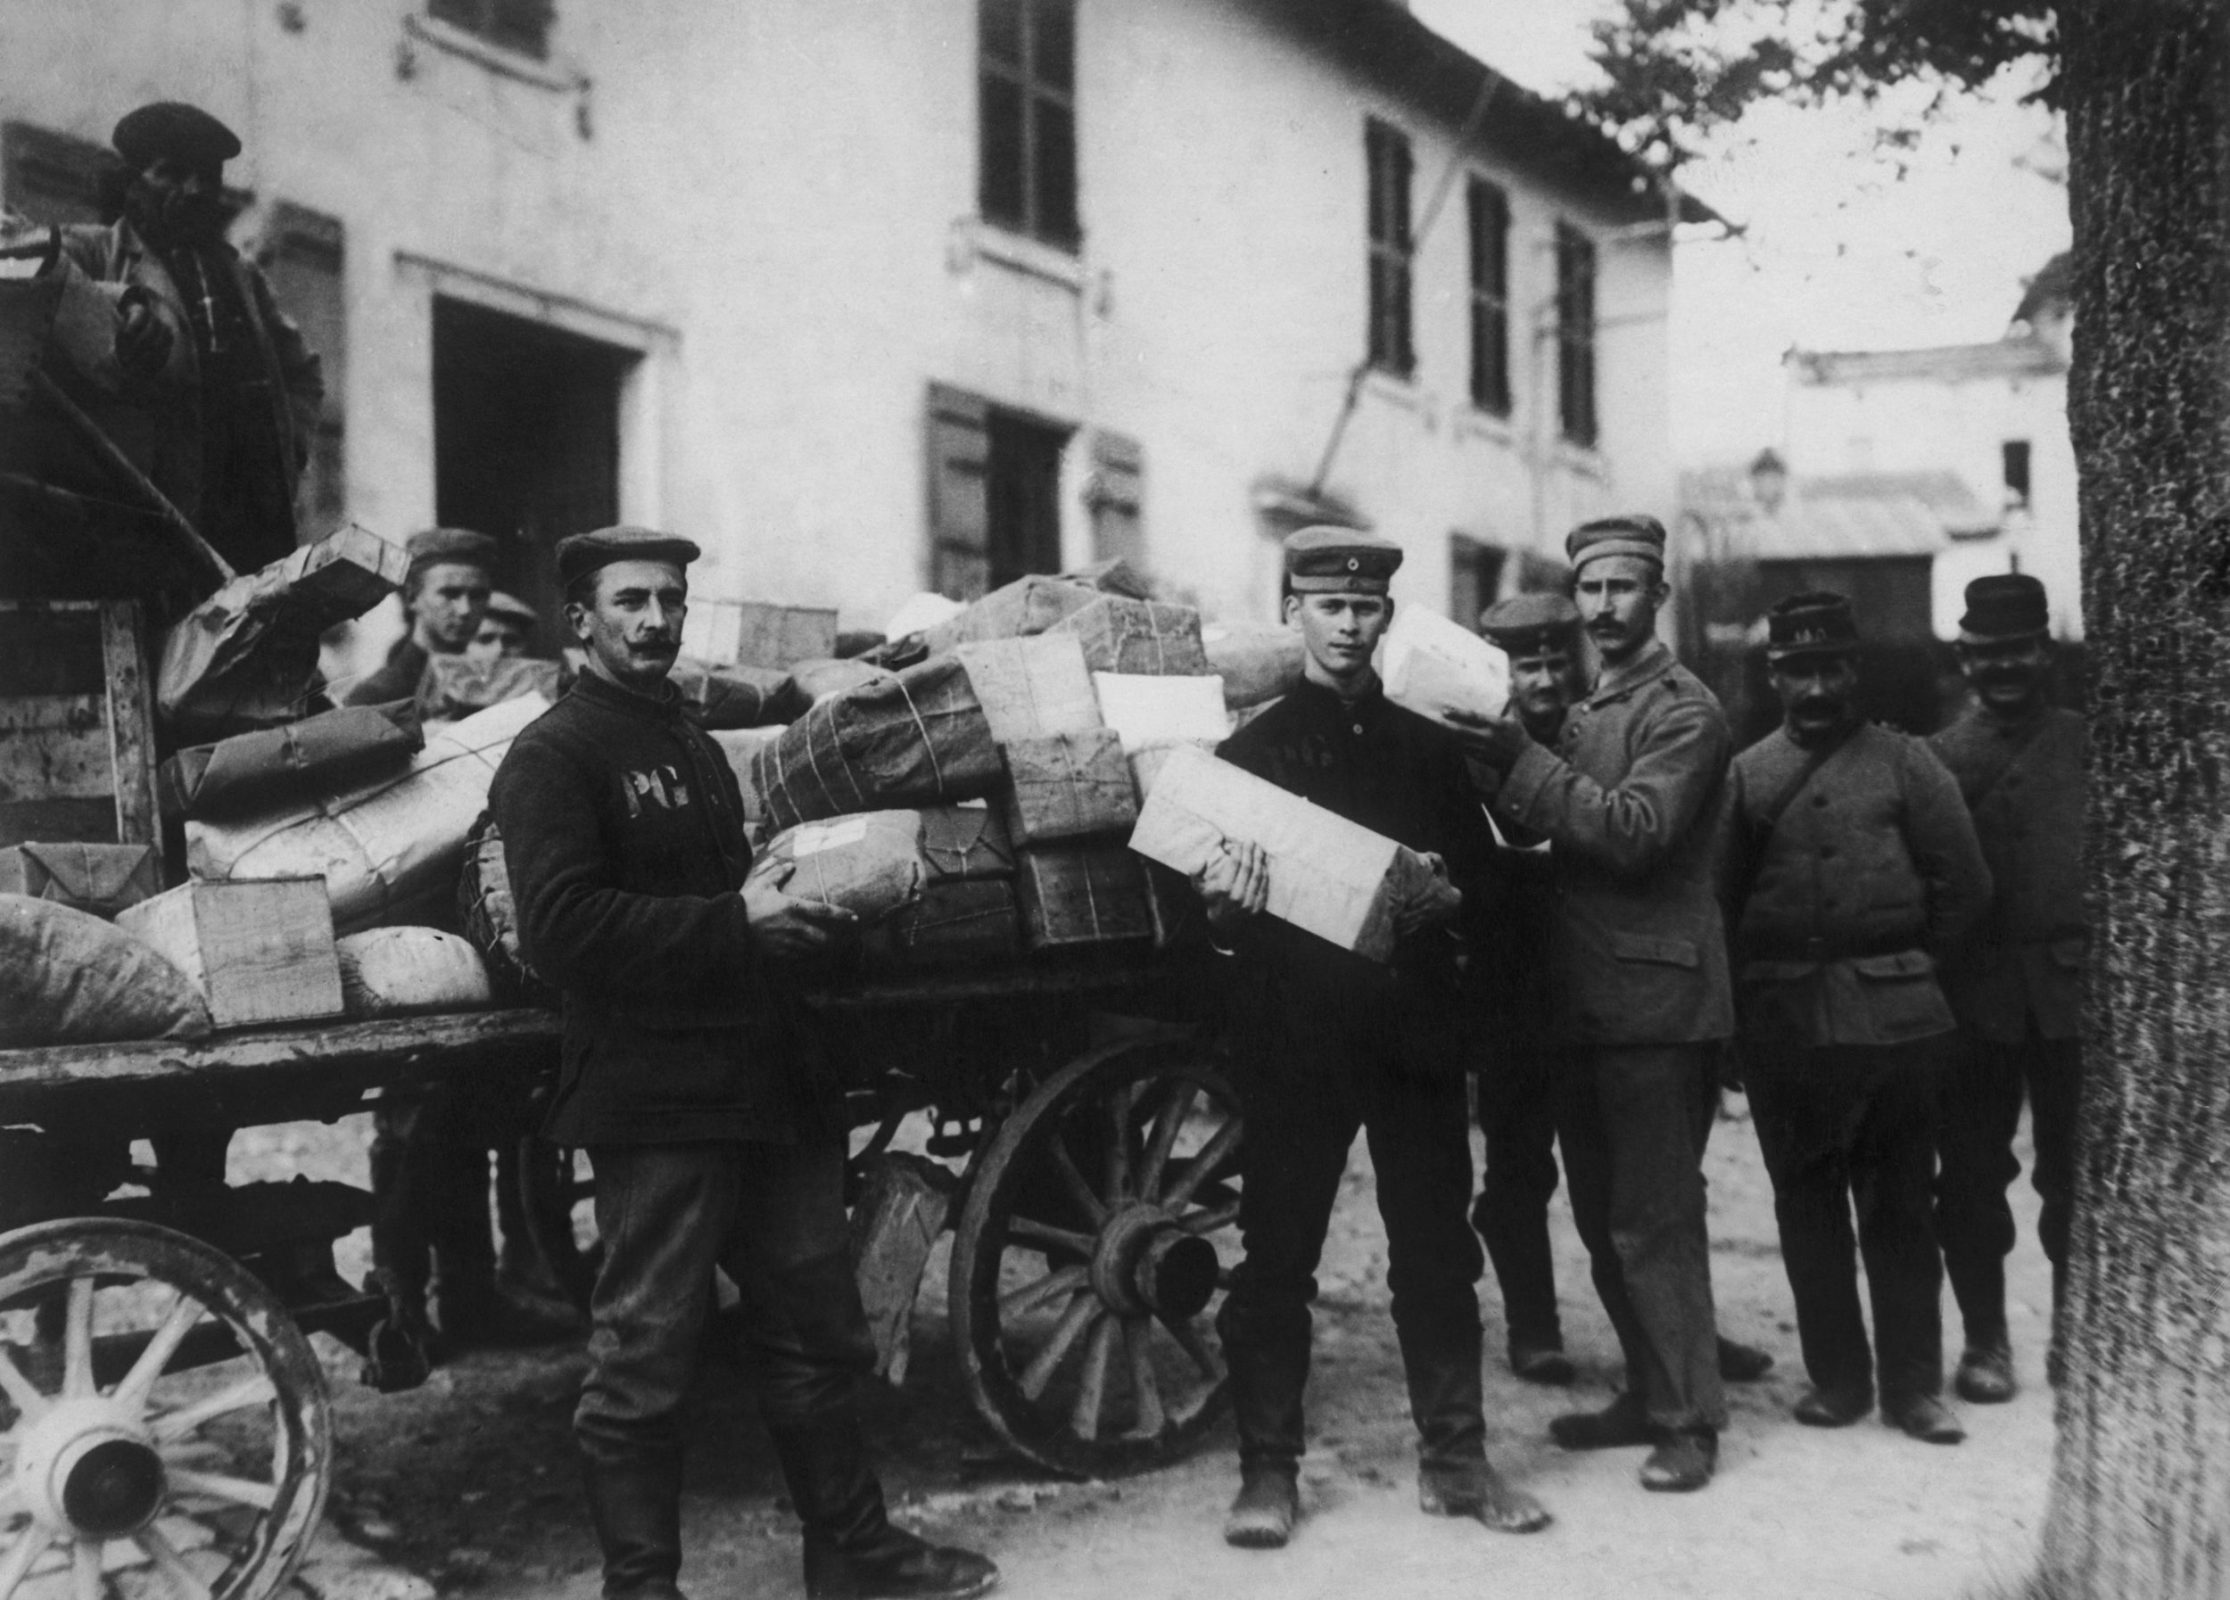 Prisoners sort mail during World War II.